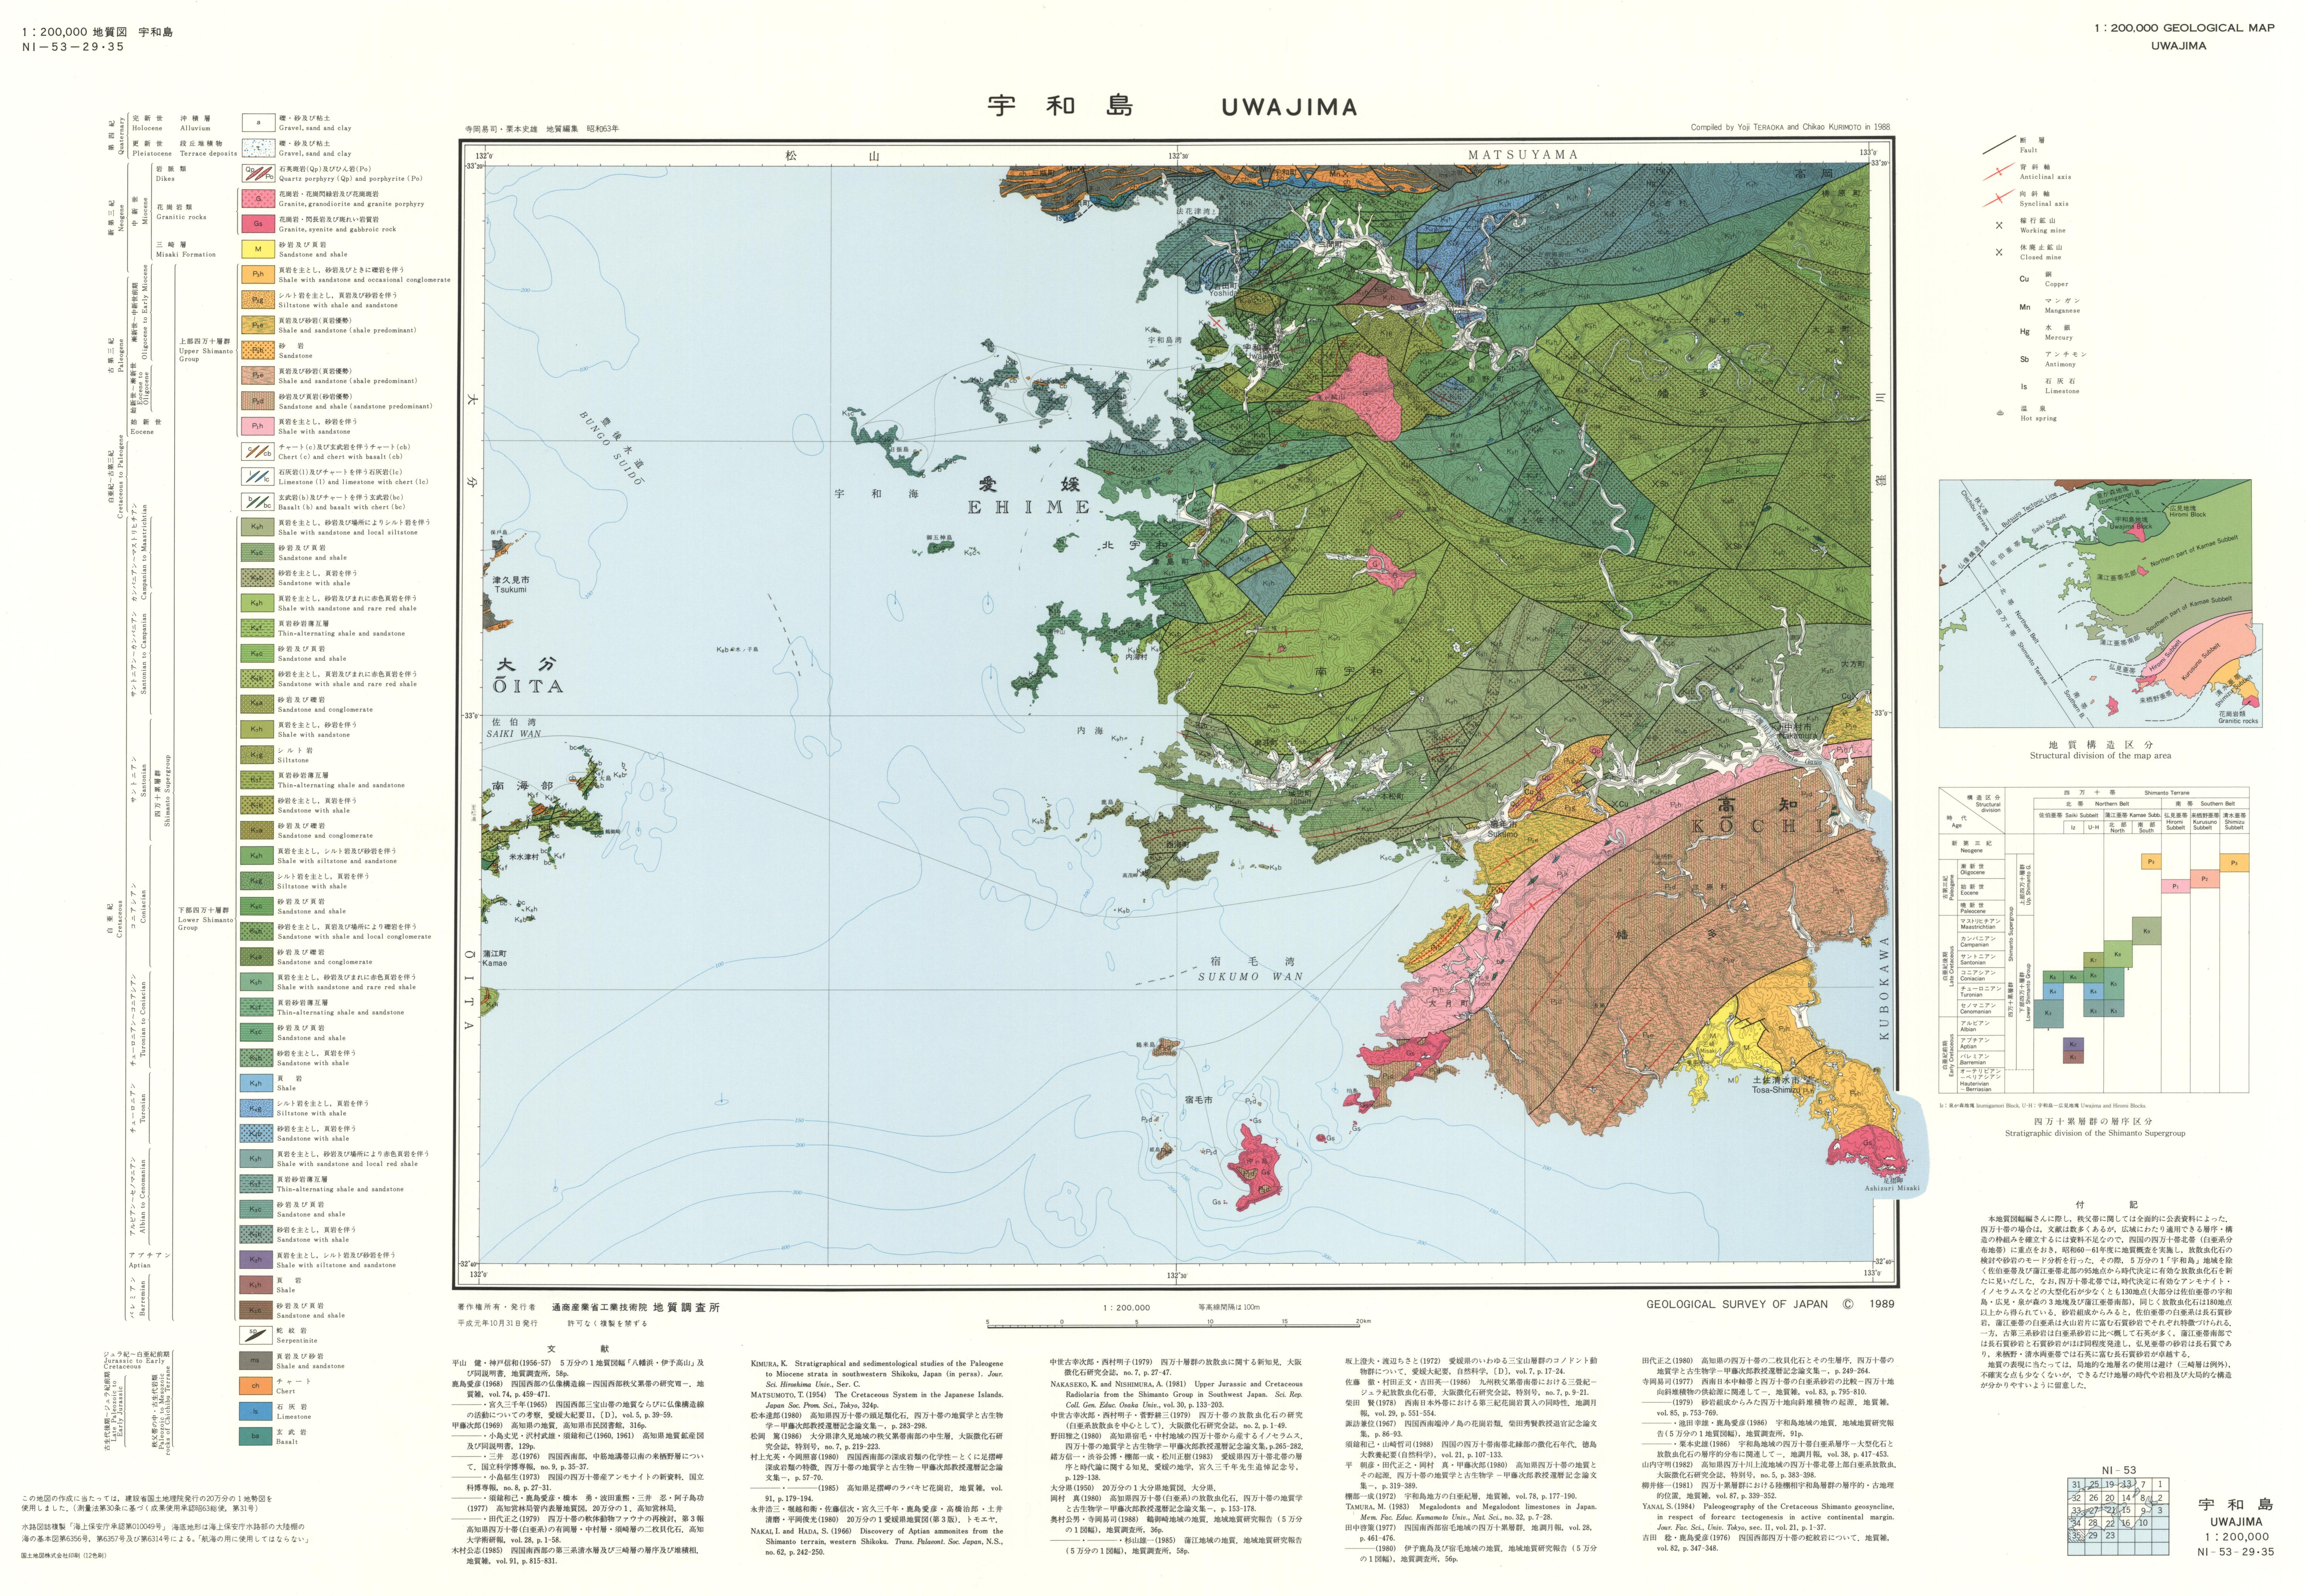 Catalogue of Geological Maps|Geological Survey of Japan/ AIST on aomori prefecture japan map, edo japan map, thailand japan map, fukuoka japan map, kanagawa prefecture japan map, iwakuni japan map, nagano prefecture japan map, uruma japan map, minamata japan map, kuji japan map, mount koya japan map, dejima japan map, tokyo japan map, honshu japan map, gifu prefecture japan map, mt. fuji japan map, hokkaido japan map, shikoku japan map, nara japan map, nagasaki japan map,